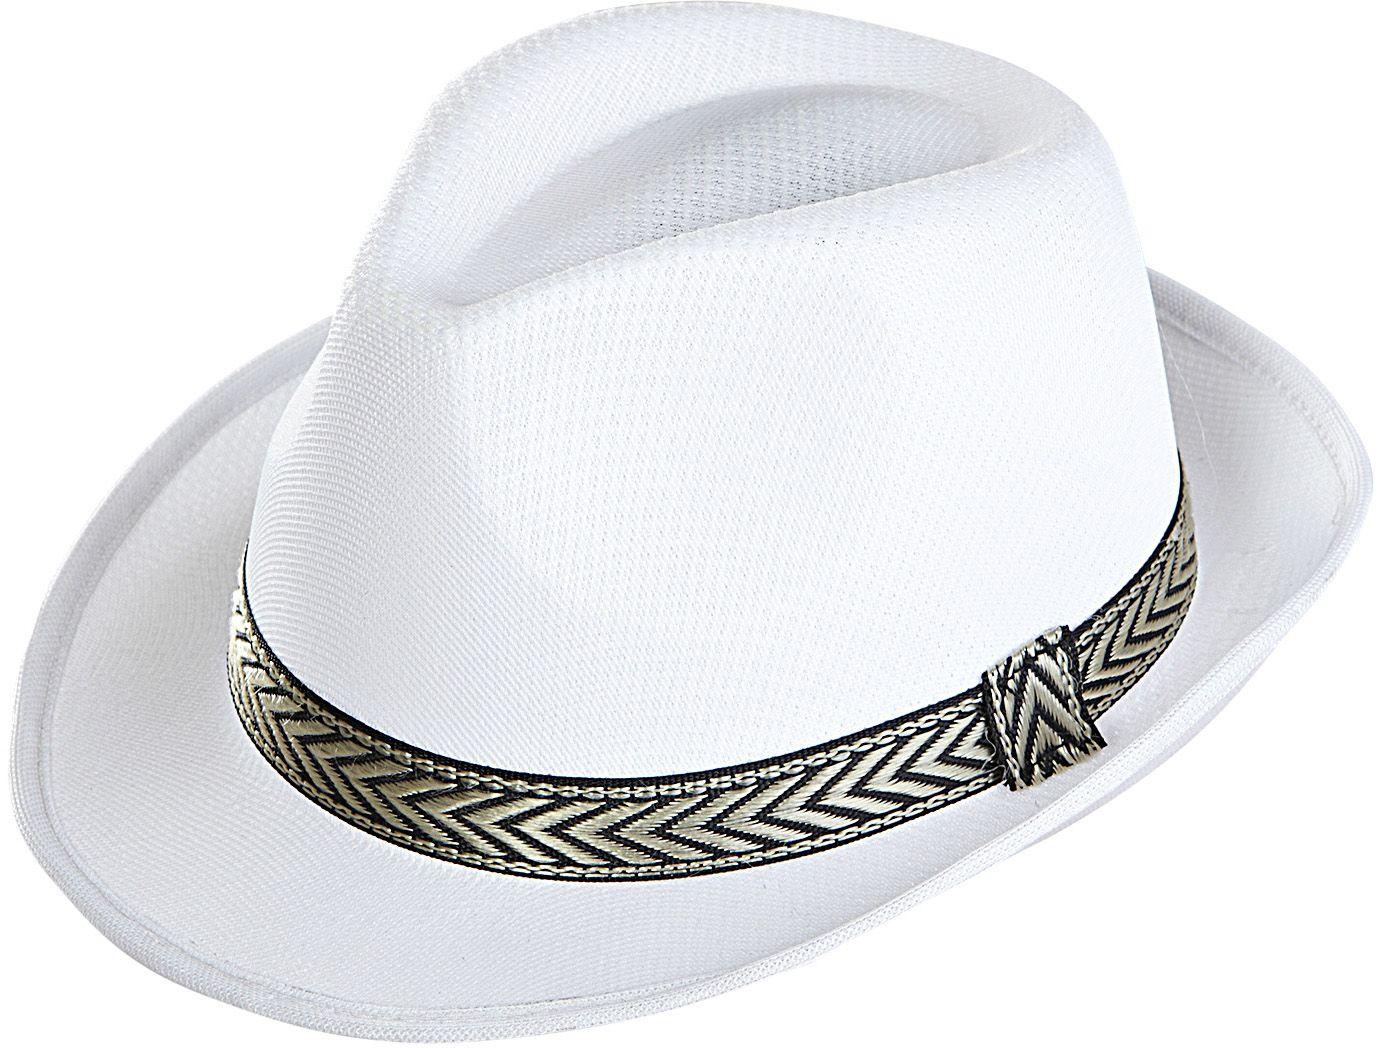 Witte panama hoed